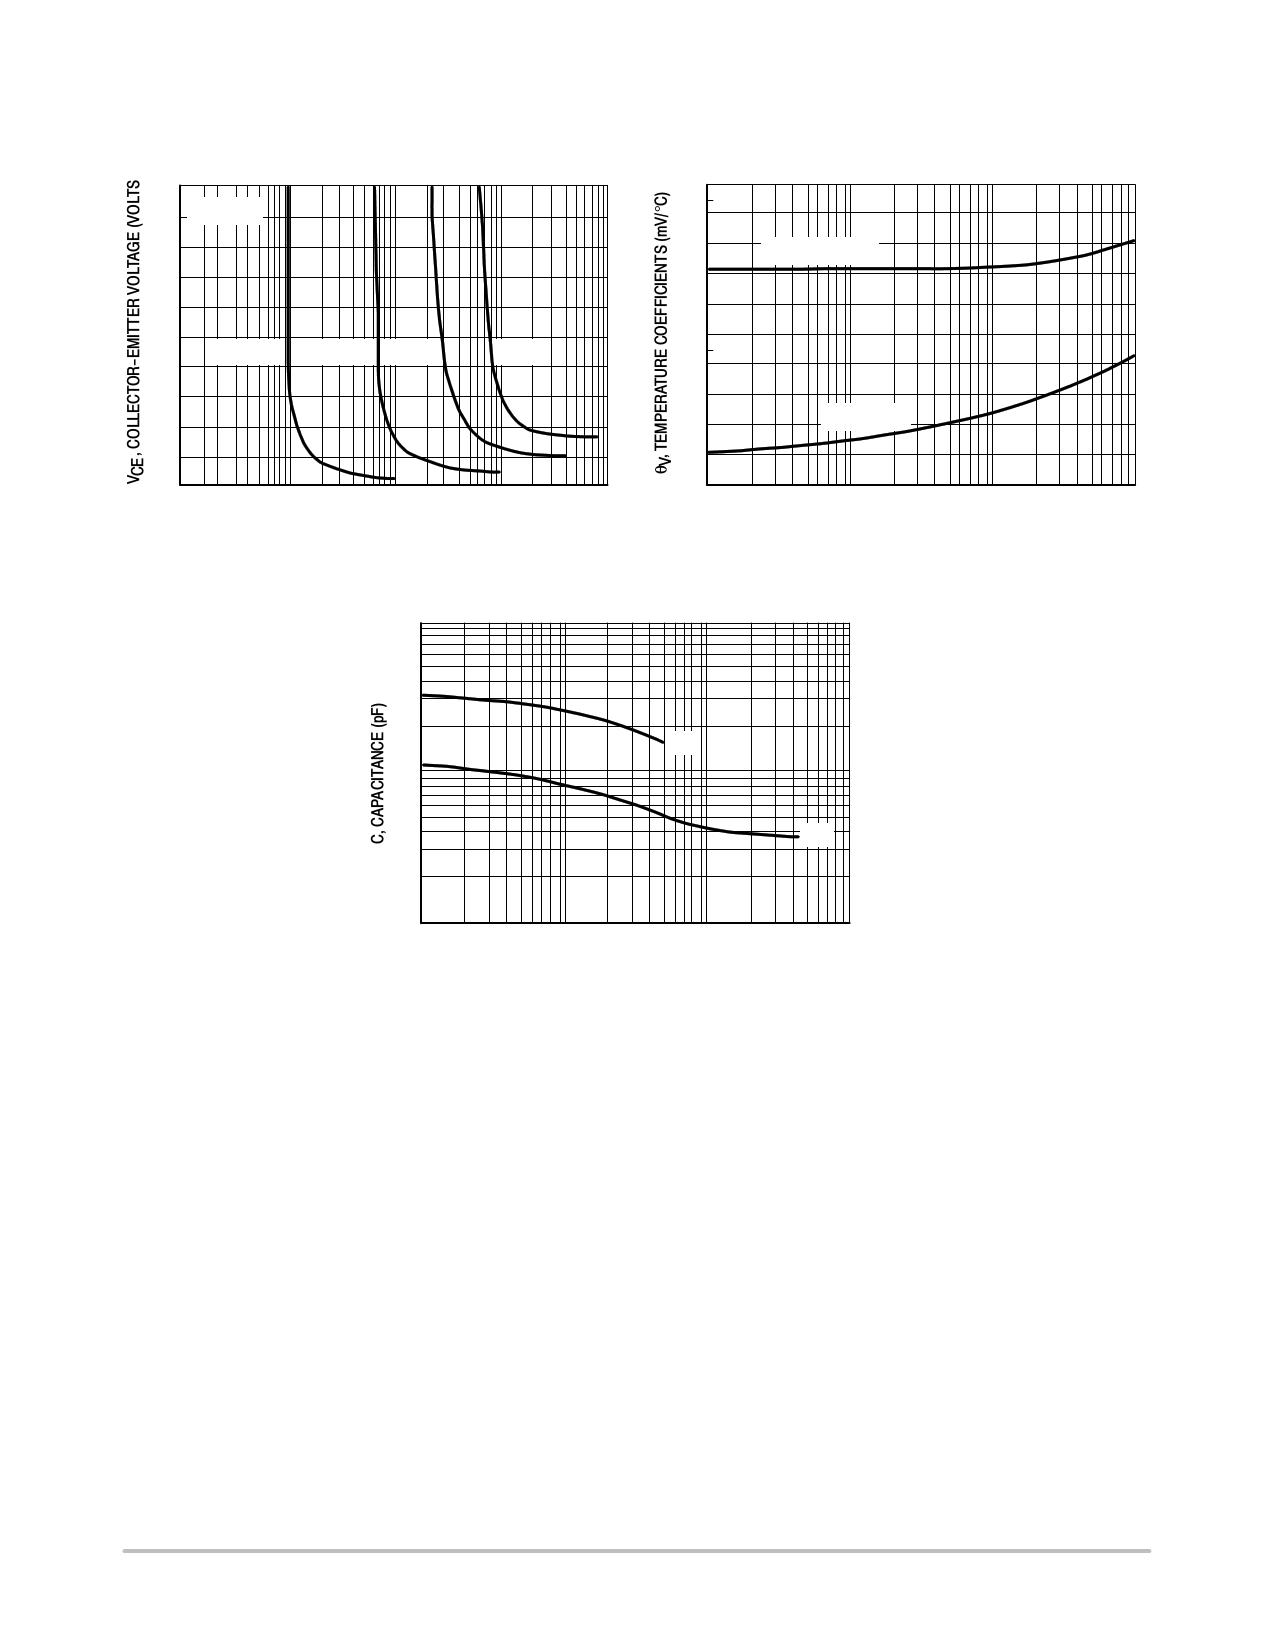 SBC817-25L pdf, 반도체, 판매, 대치품